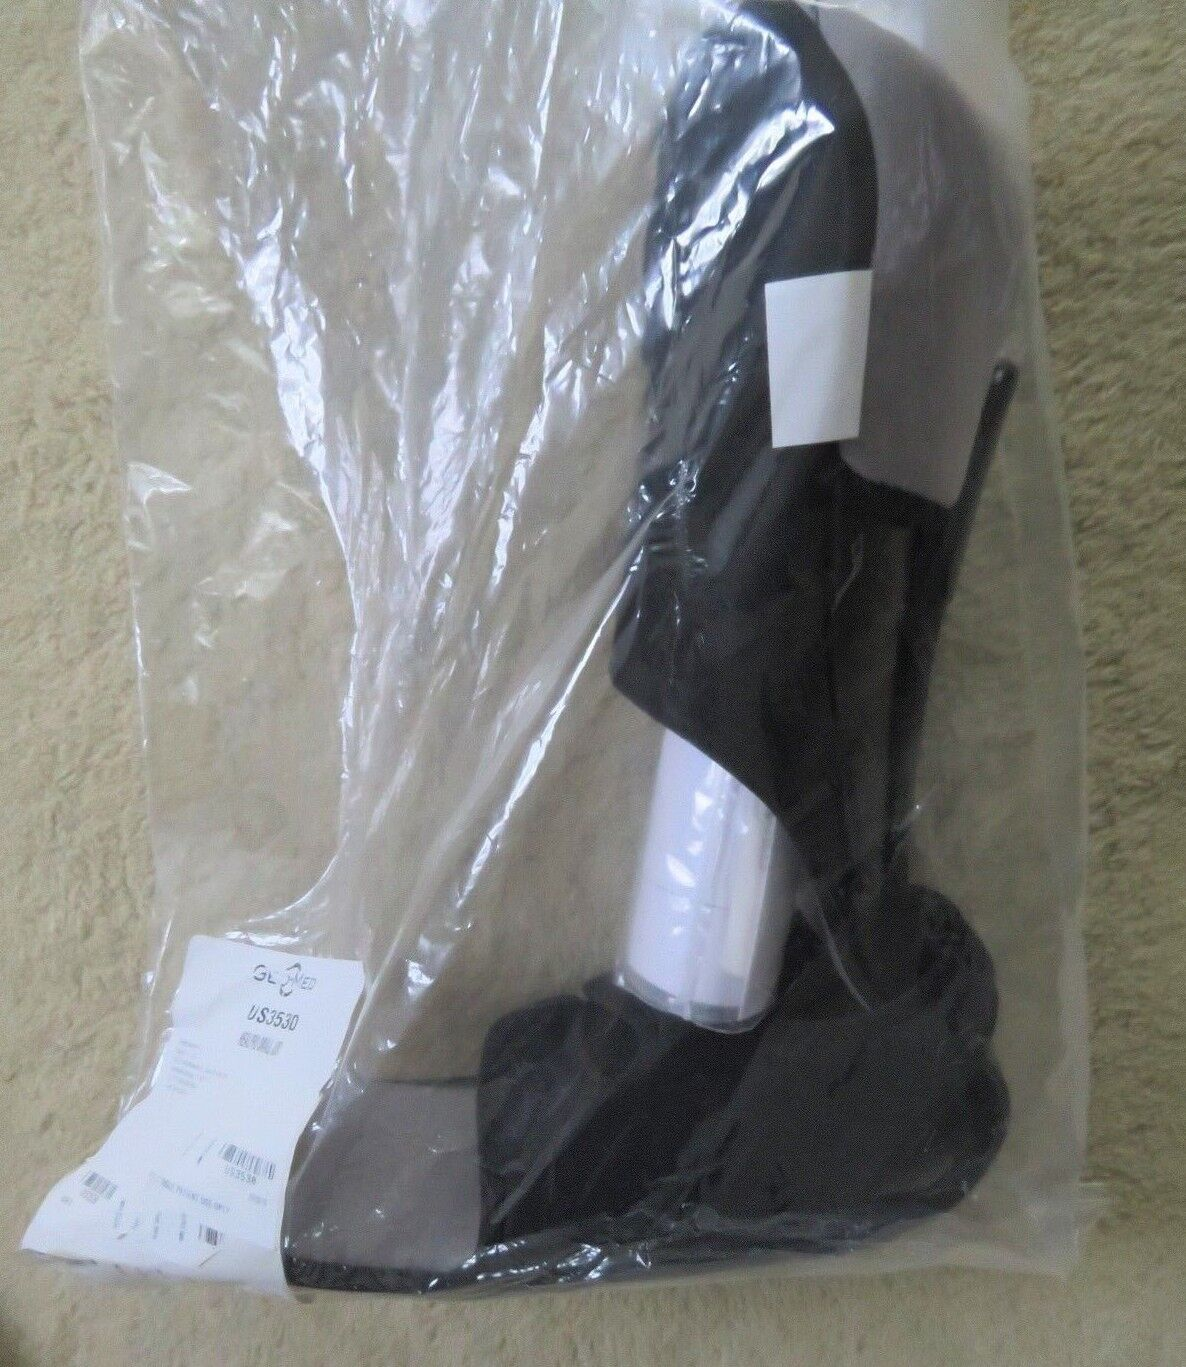 как выглядит HealPro Foot Ankle Brace Walking Boot GEO-MED US3530 US3531 Black Gray Color фото